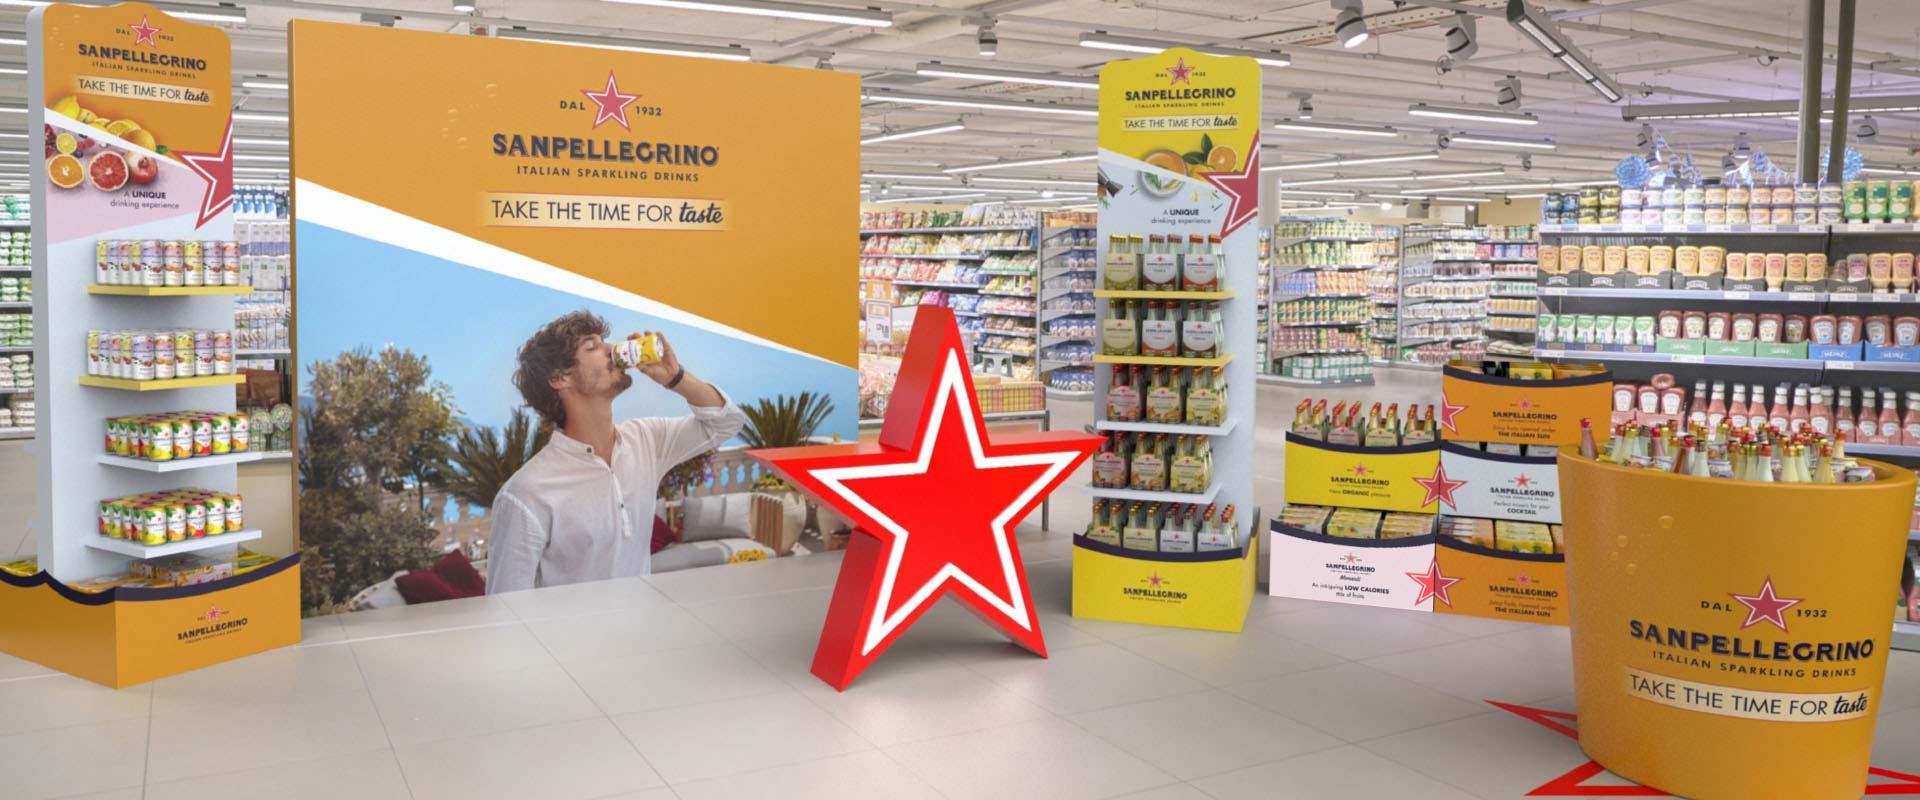 Sanpellegrino ISD modular promotional brand corner for points of sale